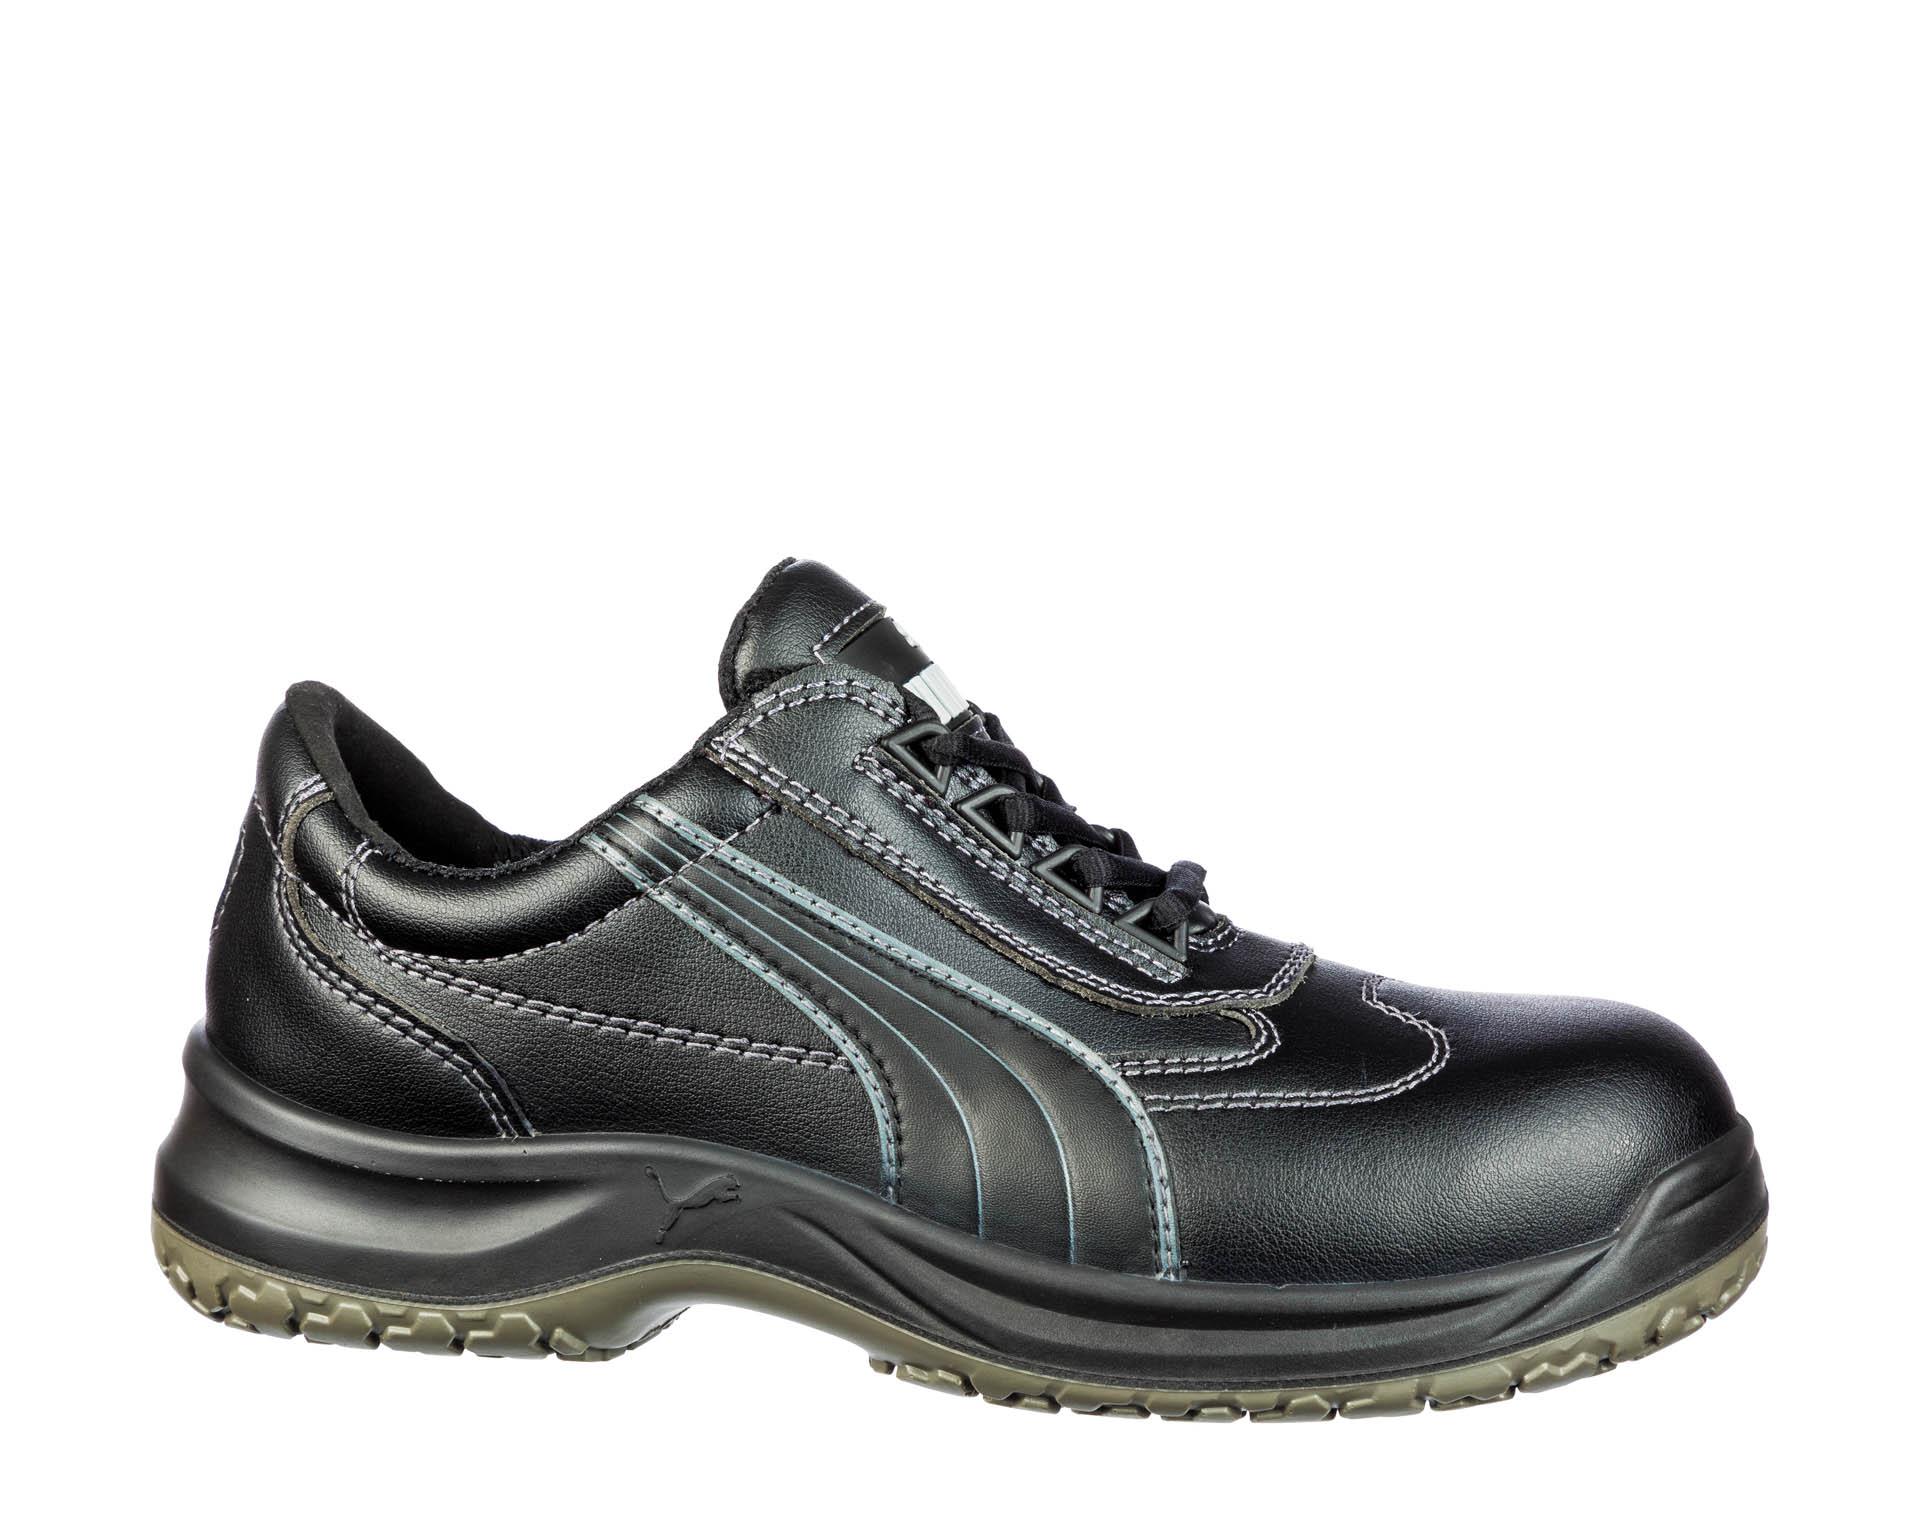 588269fa3a0 640450 Clarity Black Low|S3 SRC | Puma Safety English